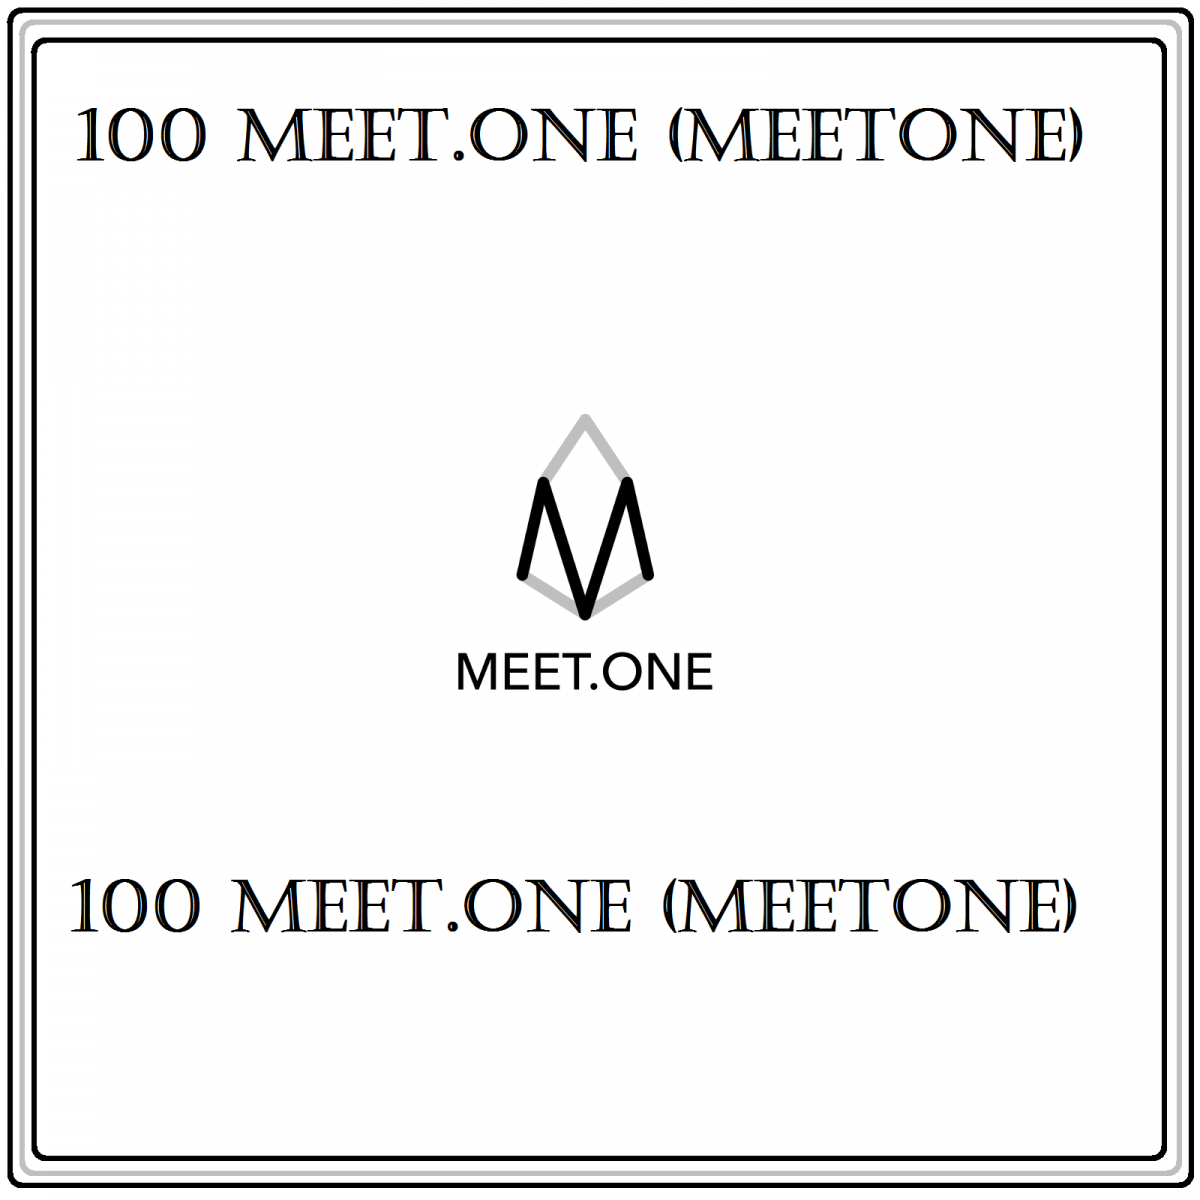 100 MEET.ONE (MEETONE) Mining Contract